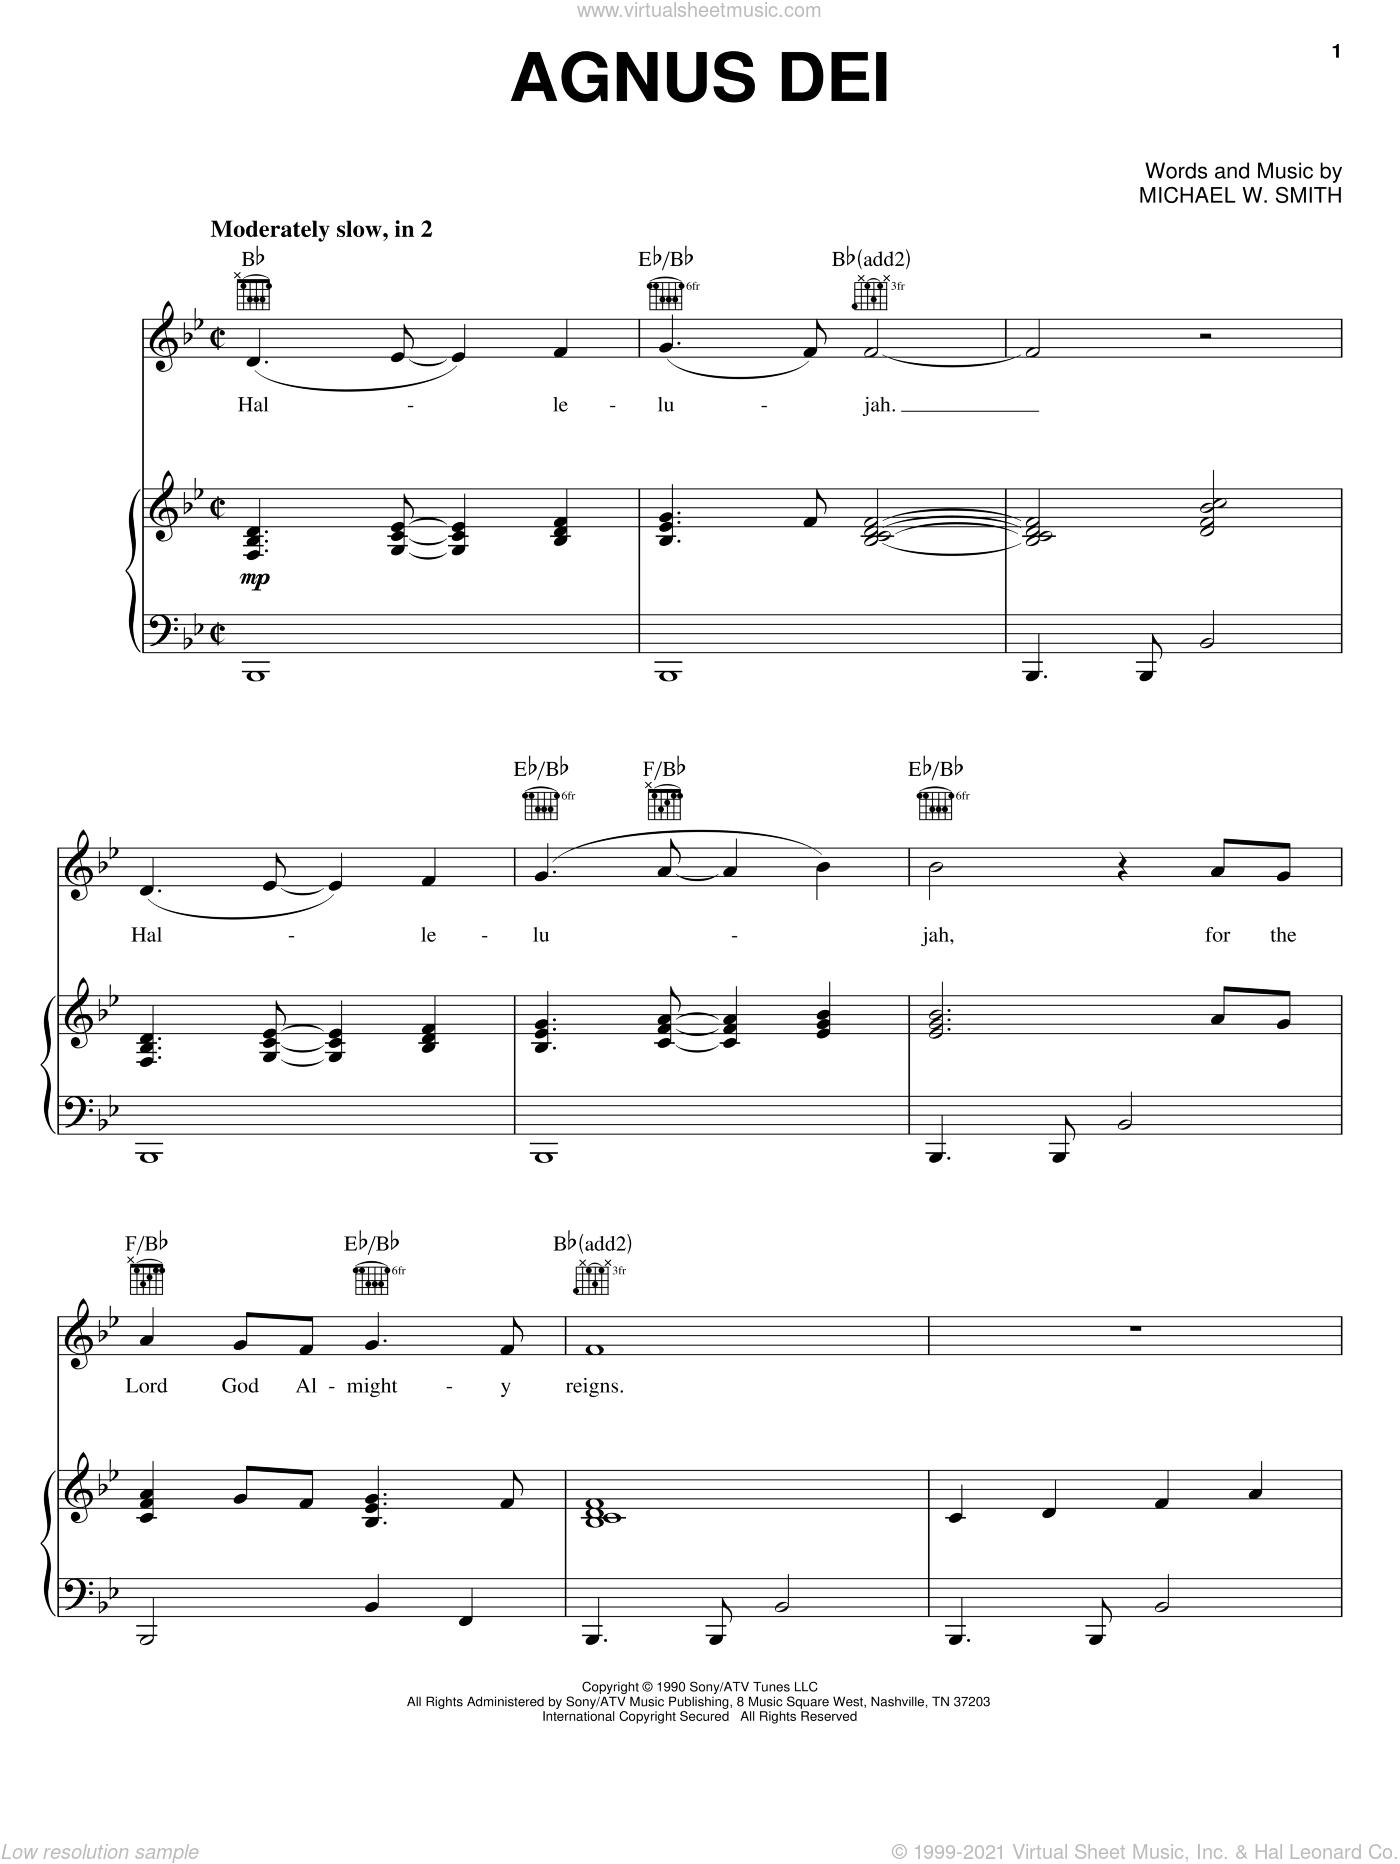 Agnus Dei sheet music for voice, piano or guitar by Donnie McClurkin and Michael W. Smith, intermediate skill level